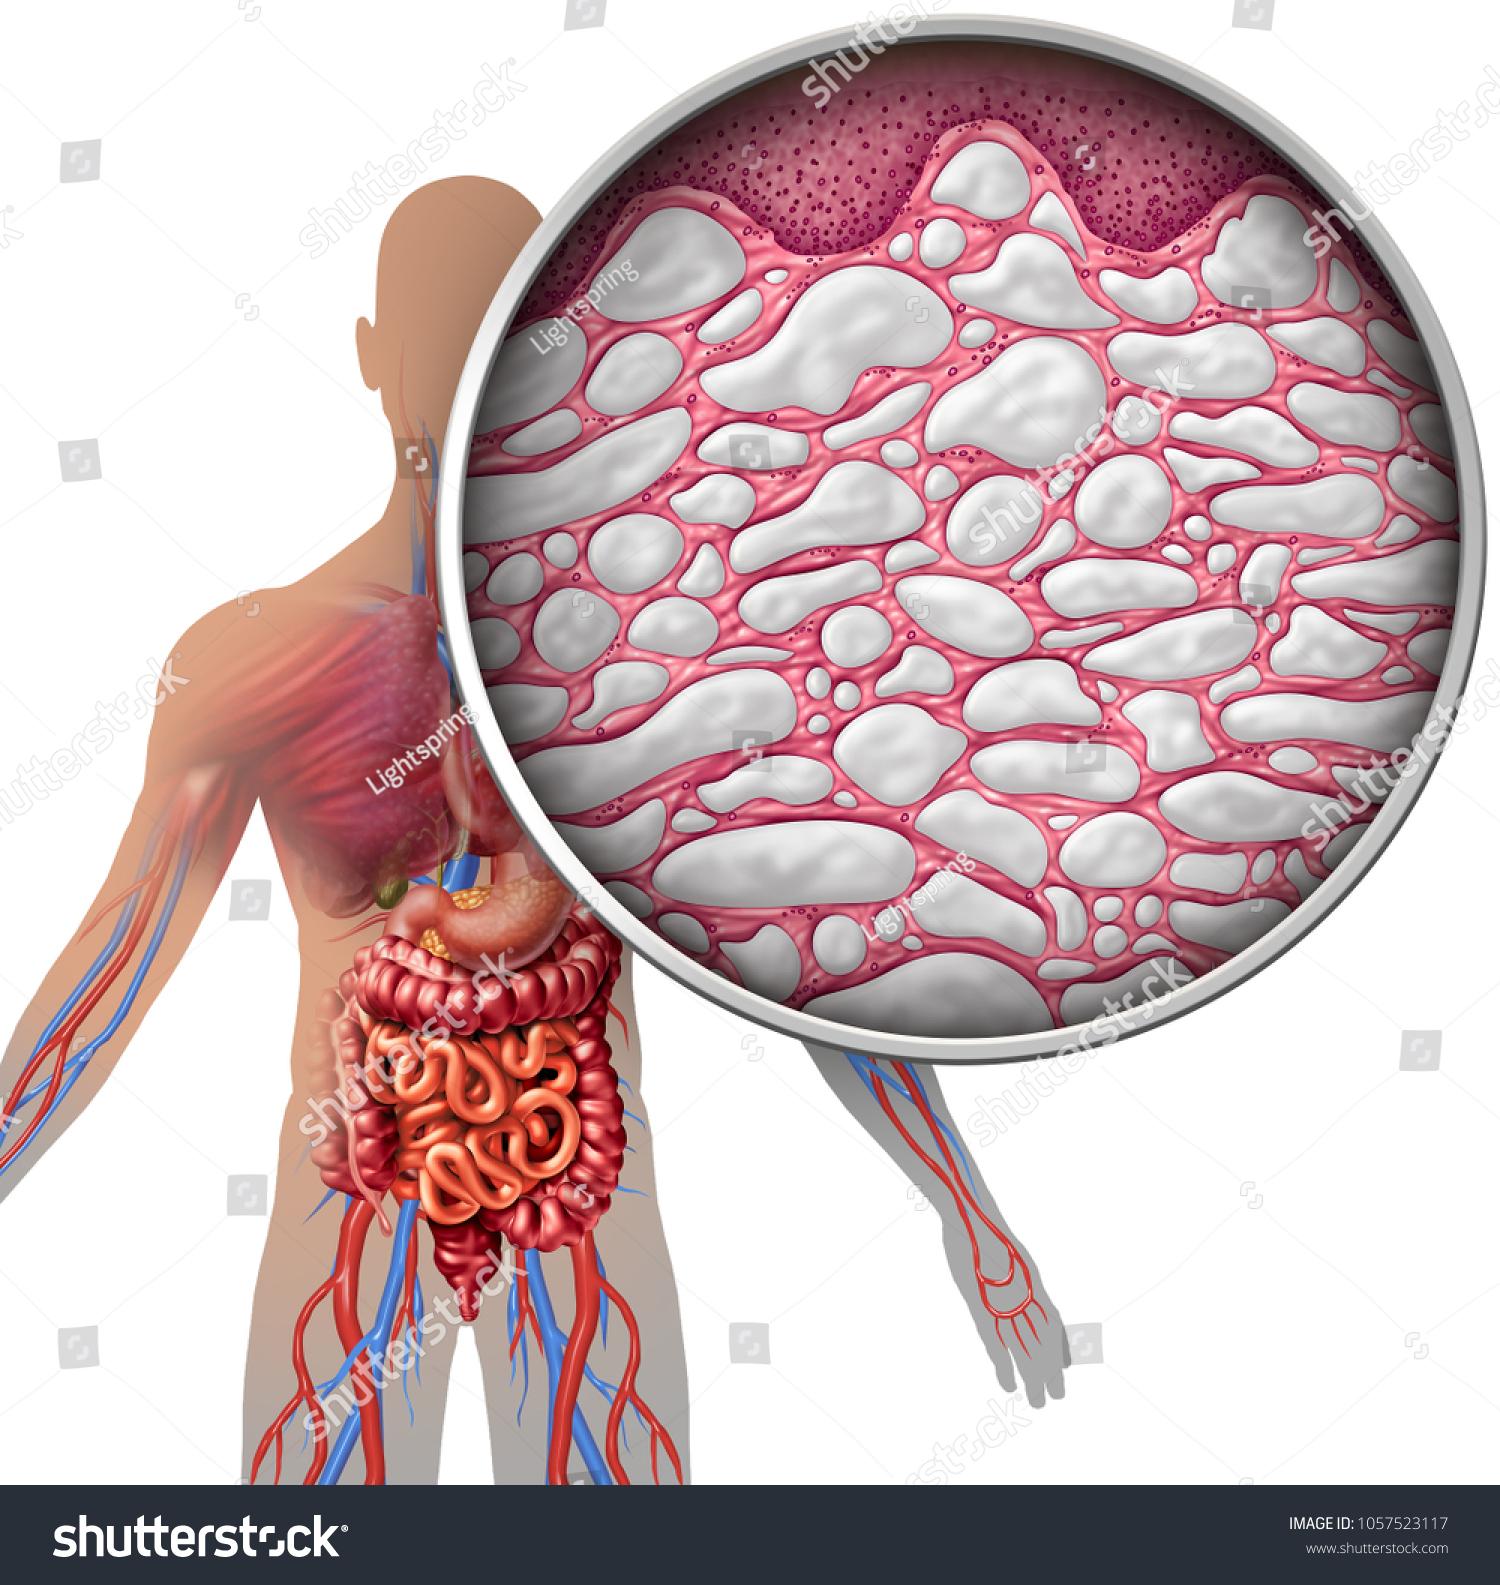 Interstitium Human Body Anatomy Organs Concept Stockillustration